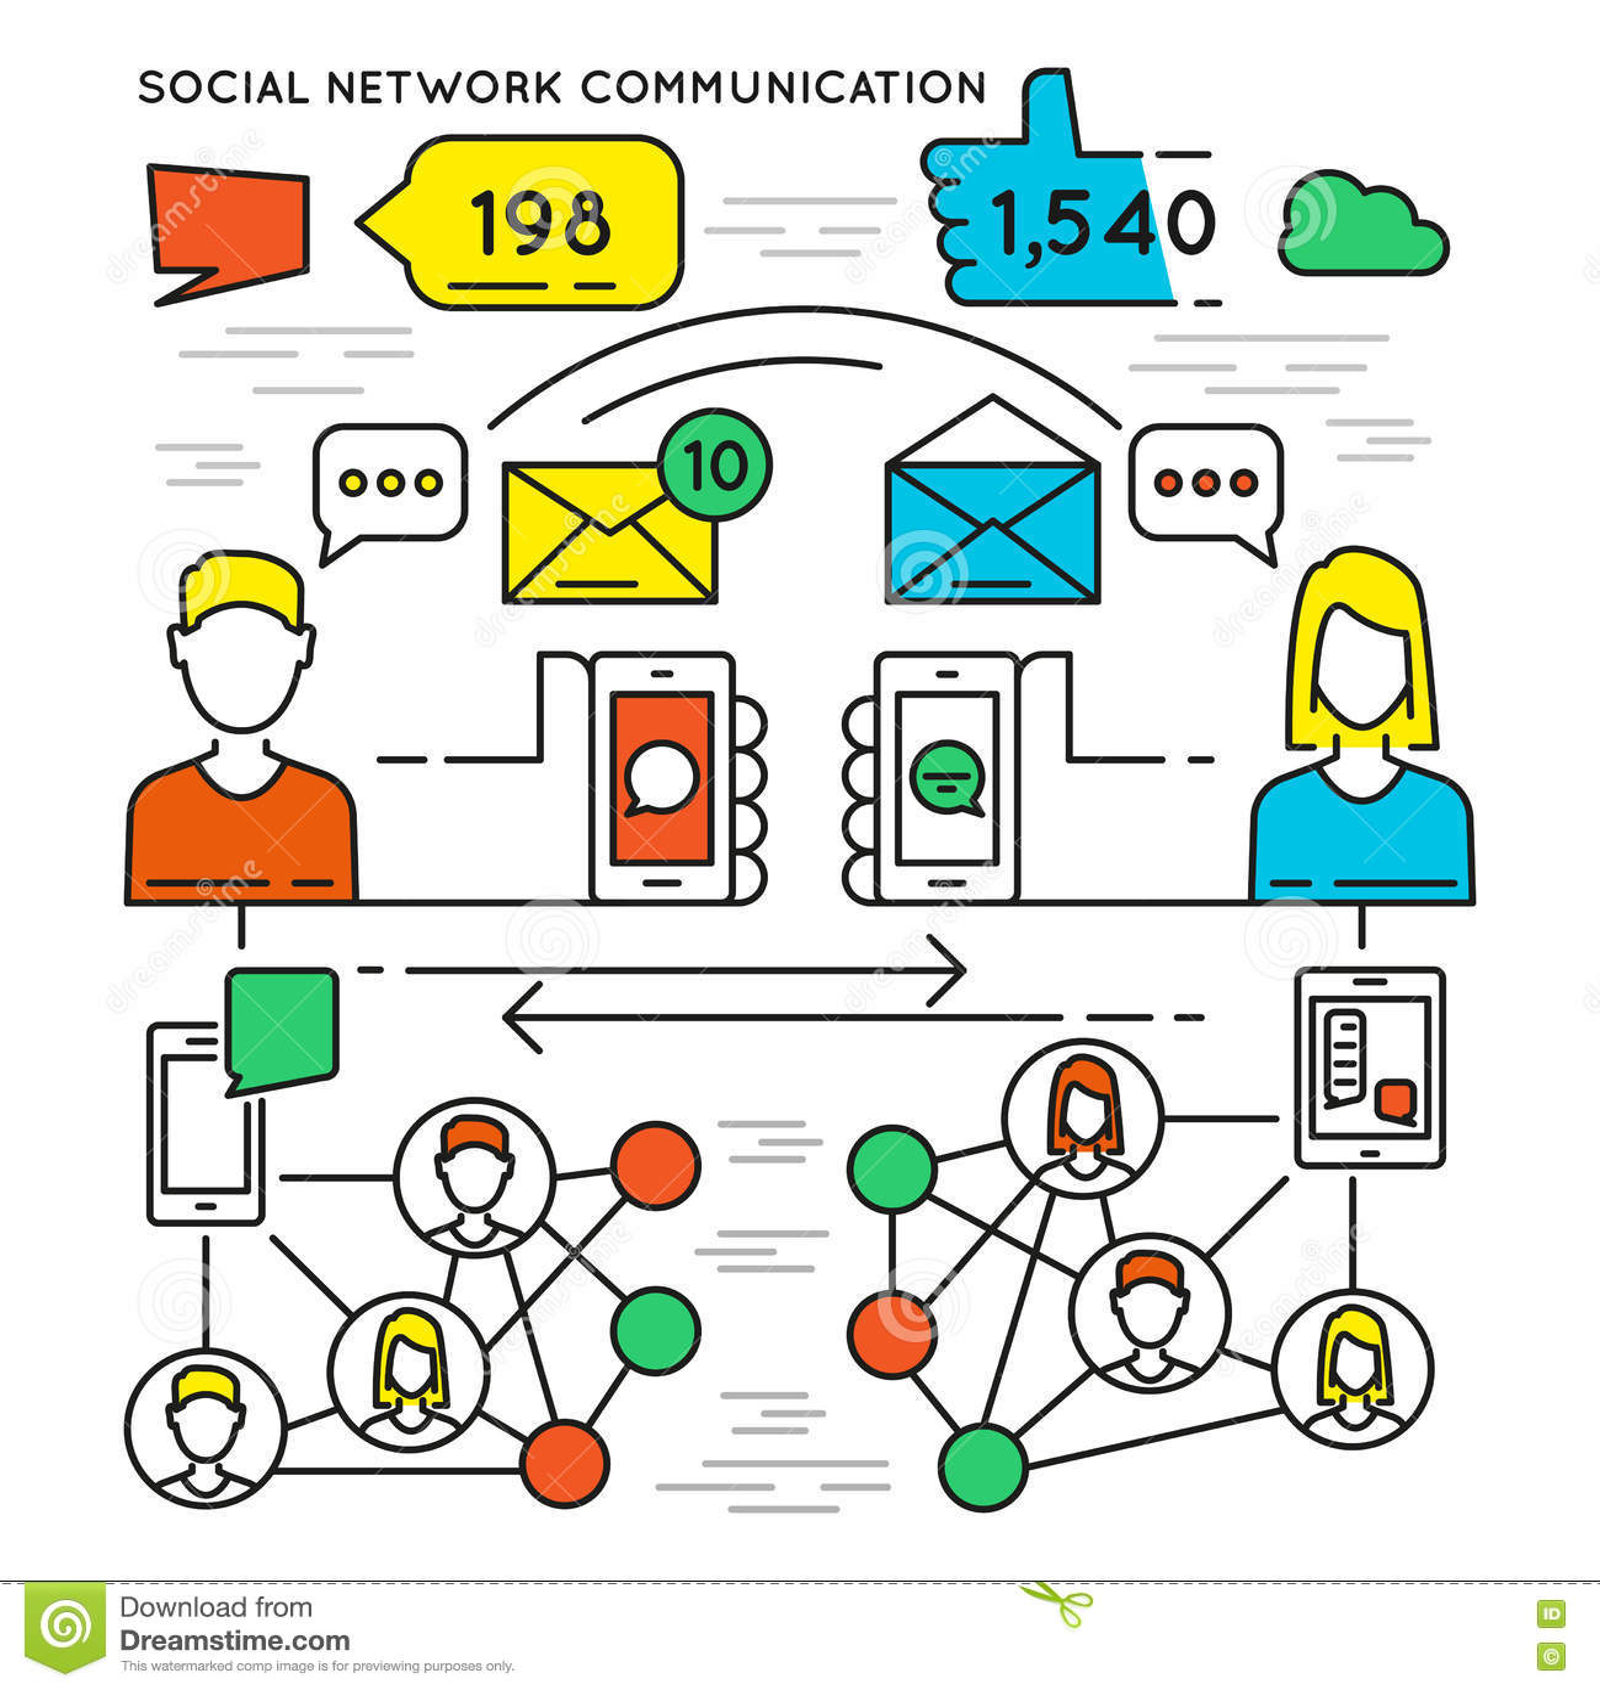 social network communication poster